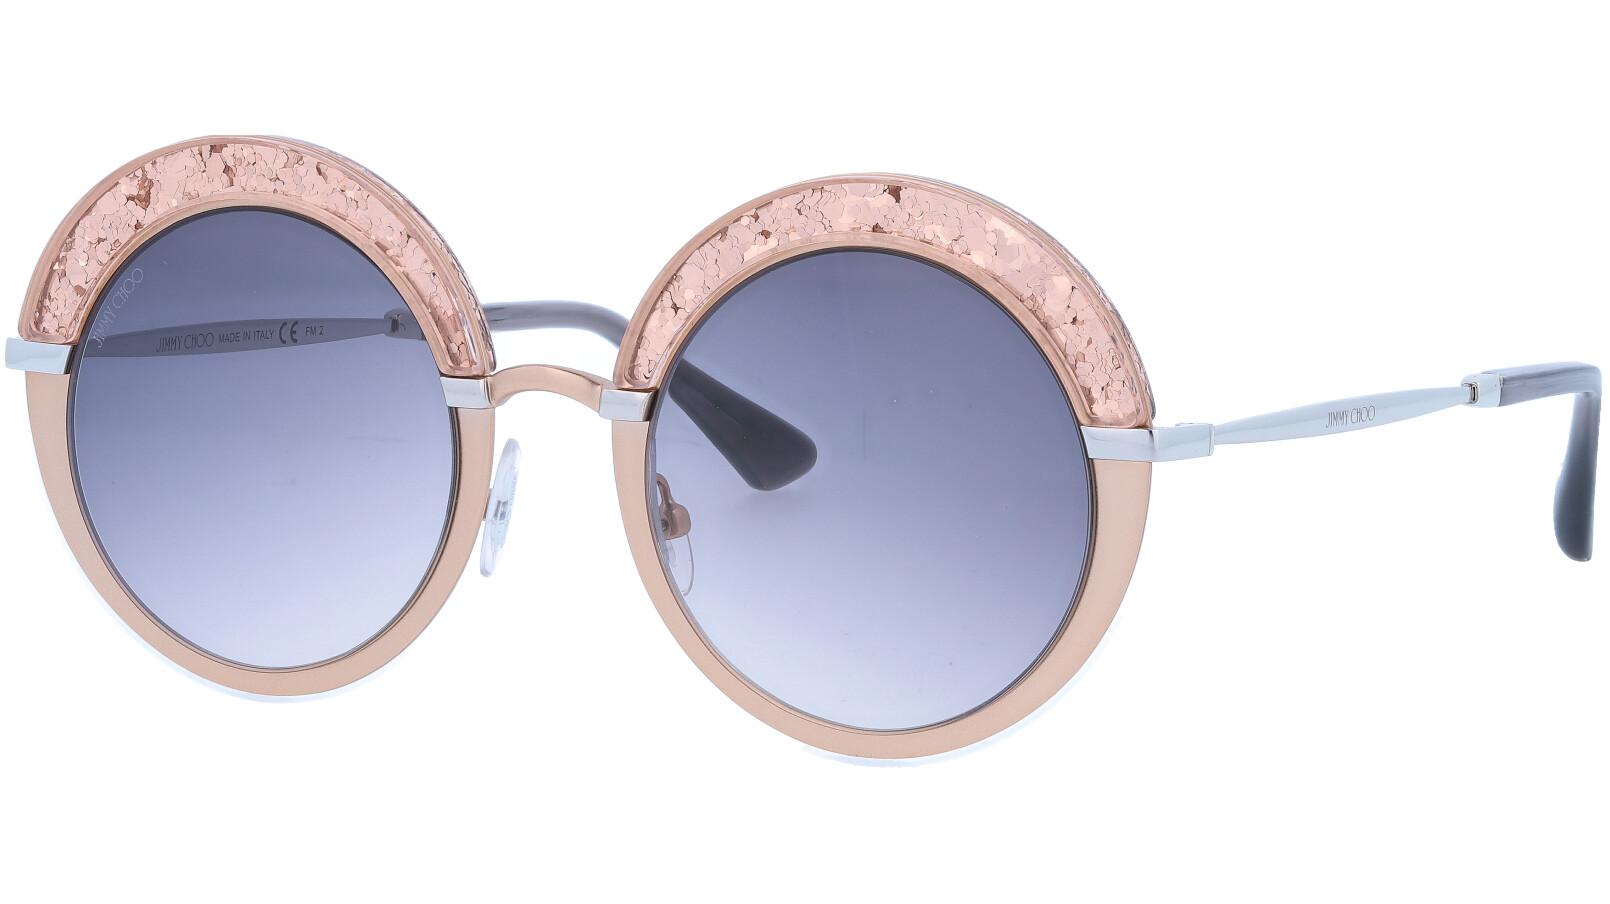 Jimmy Choo GOTHAS 68I9C 50 Nude Sunglasses